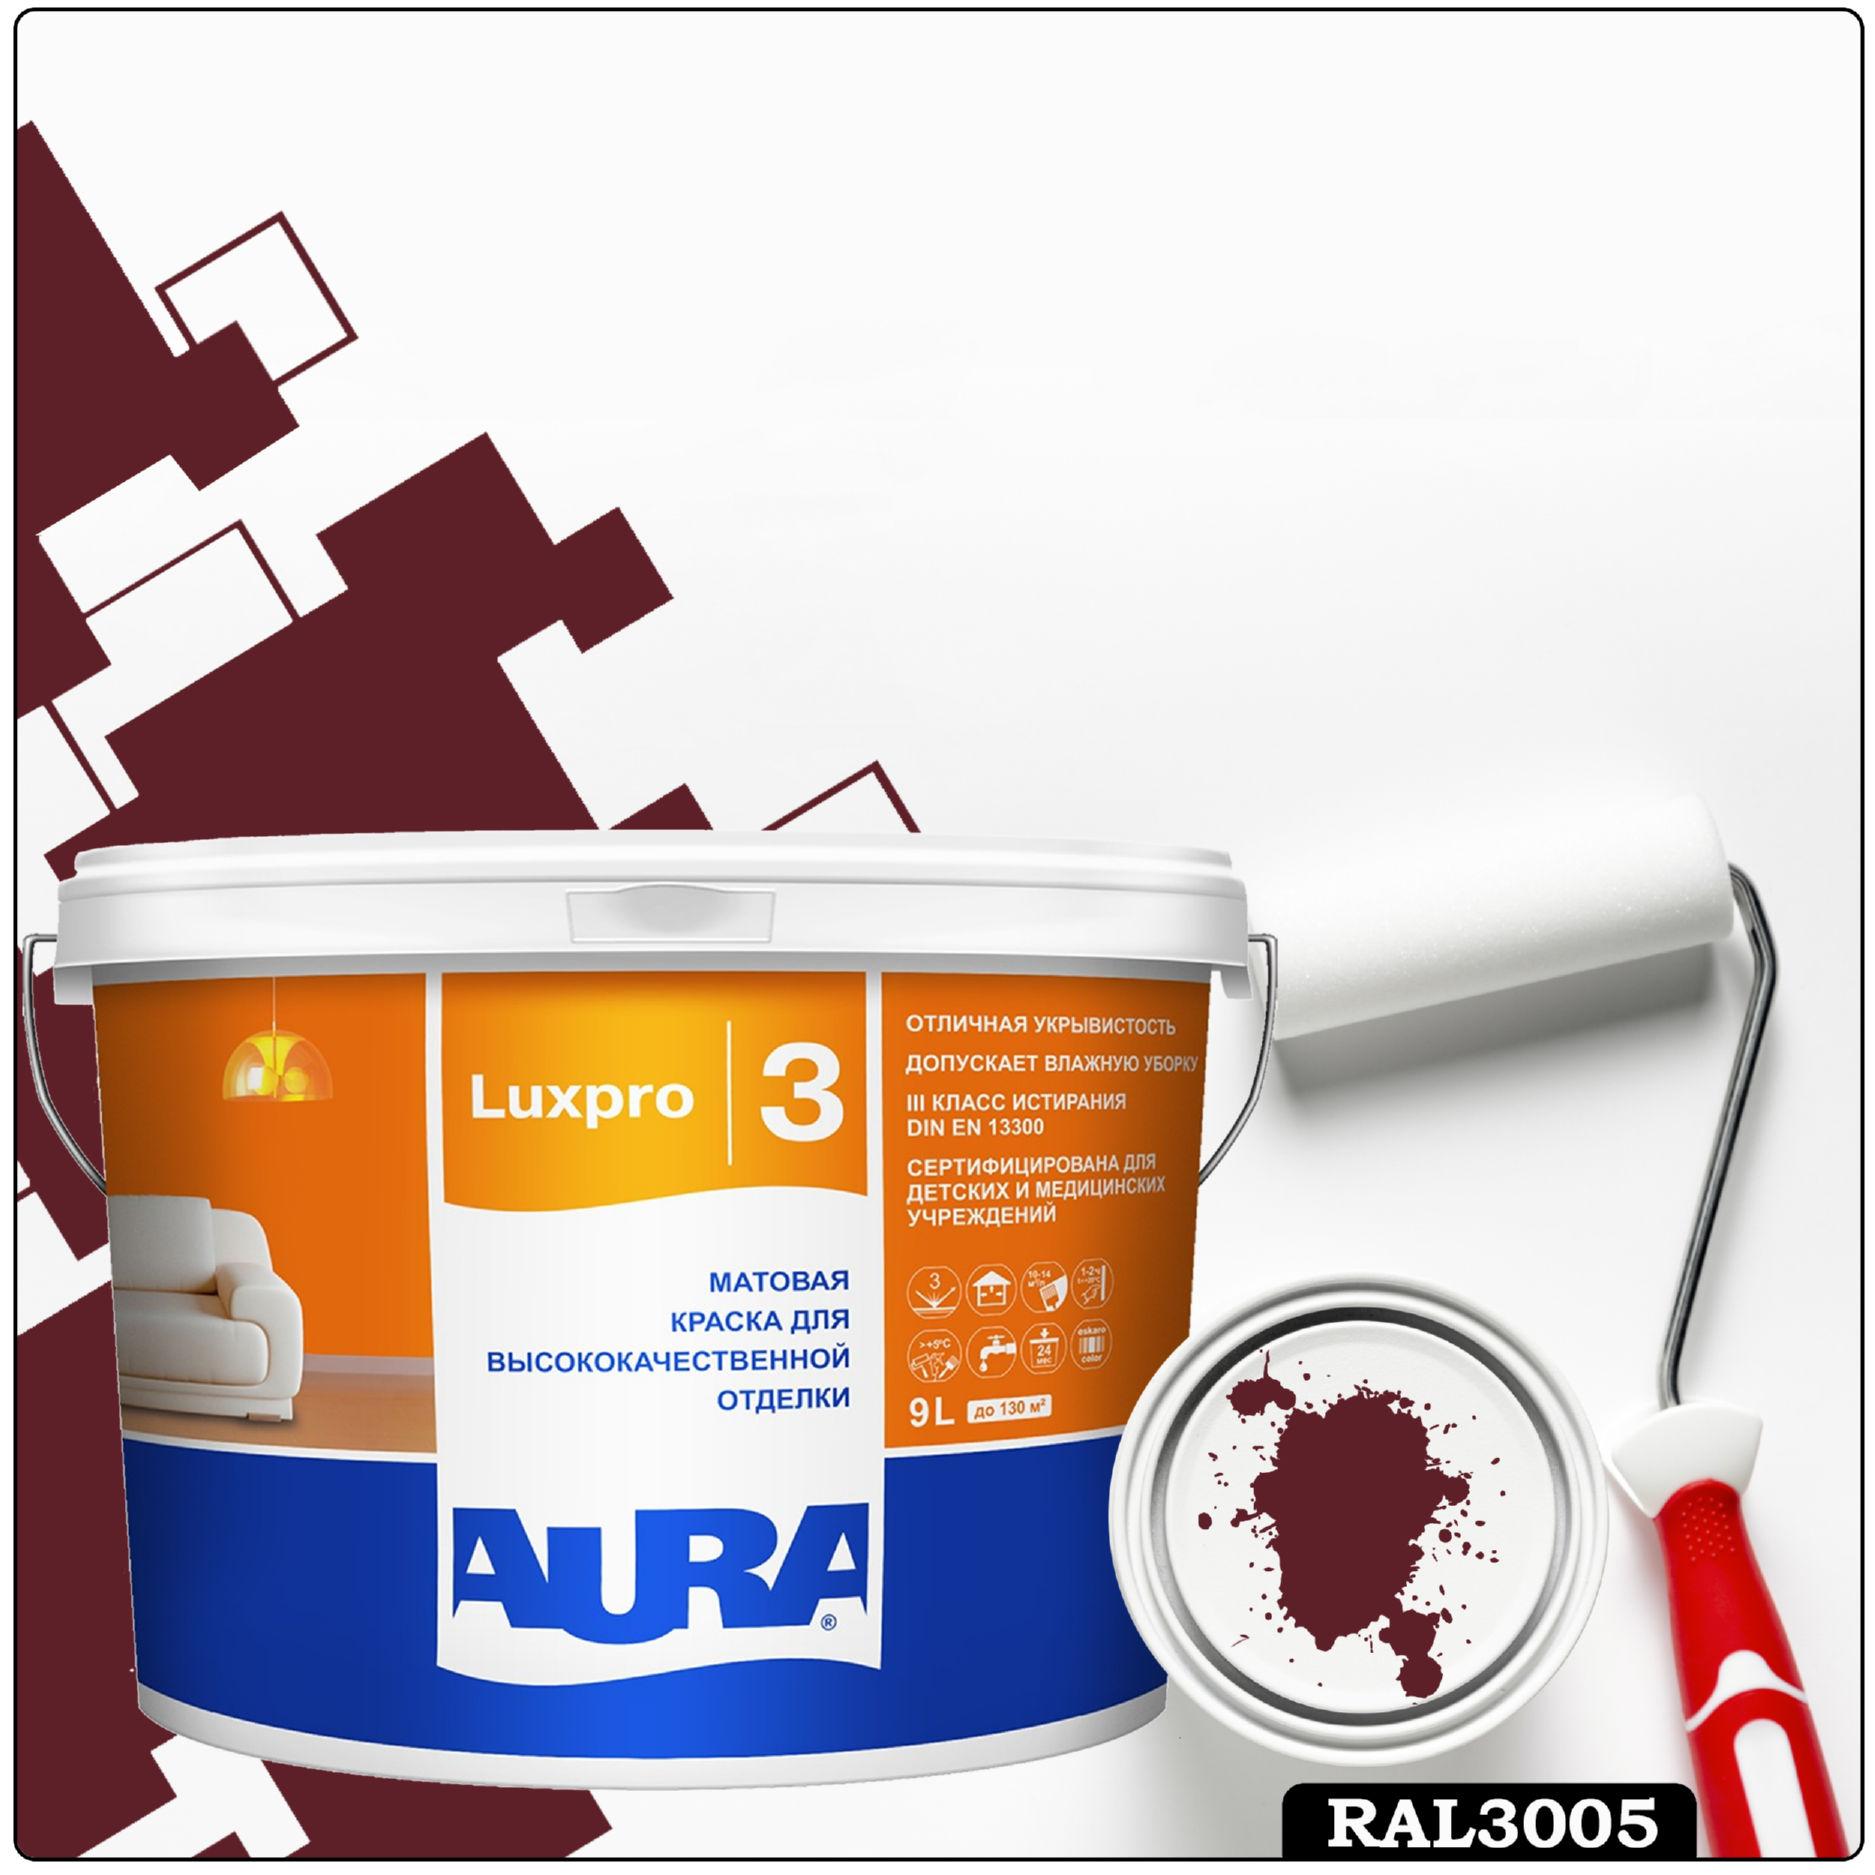 Фото 6 - Краска Aura LuxPRO 3, RAL 3005 Вишневый, латексная, шелково-матовая, интерьерная, 9л, Аура.